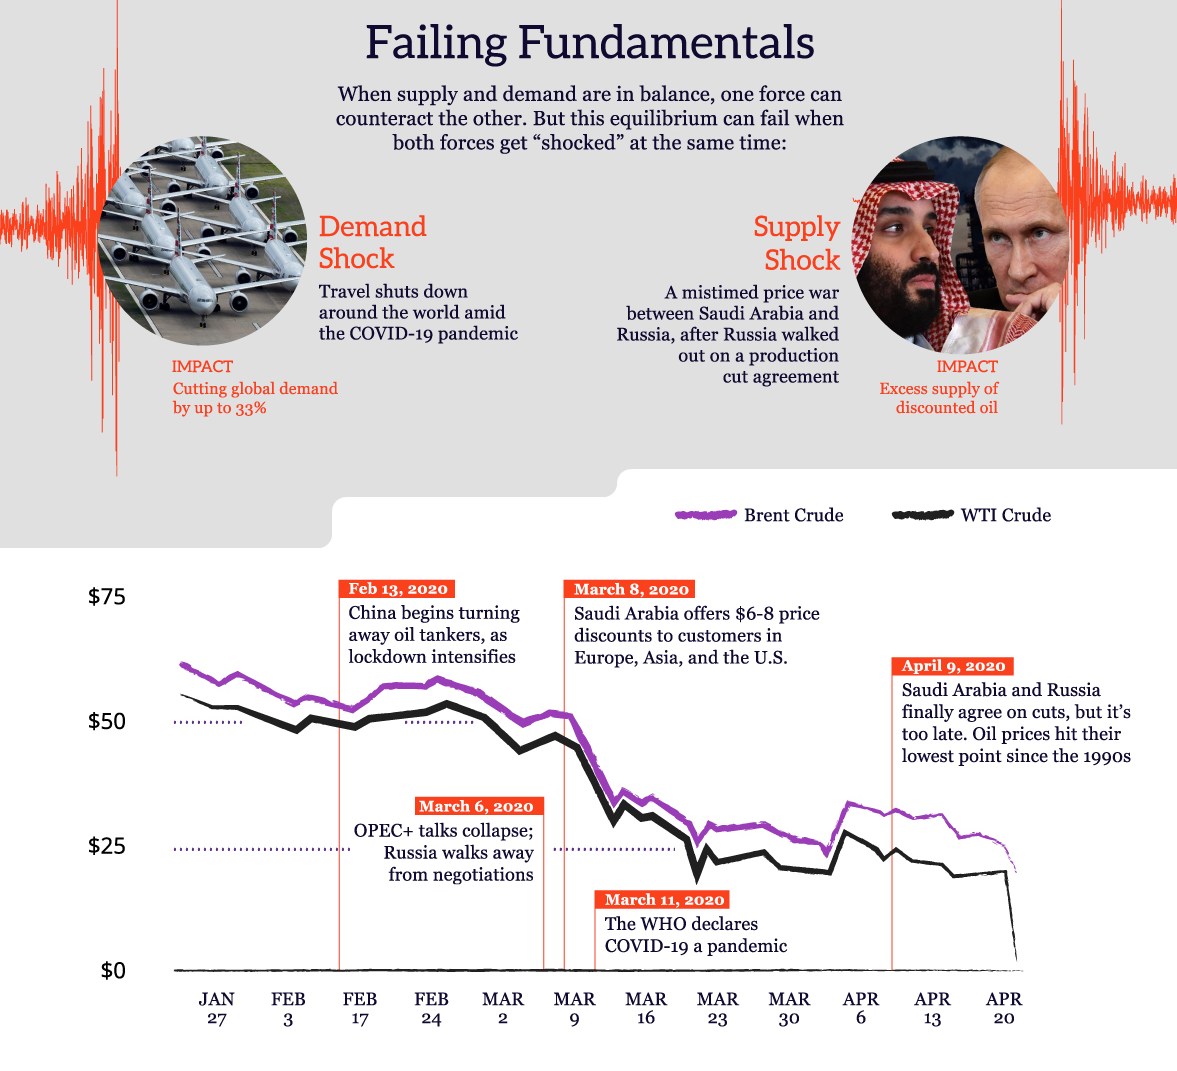 Failing Fundamentals Infographic